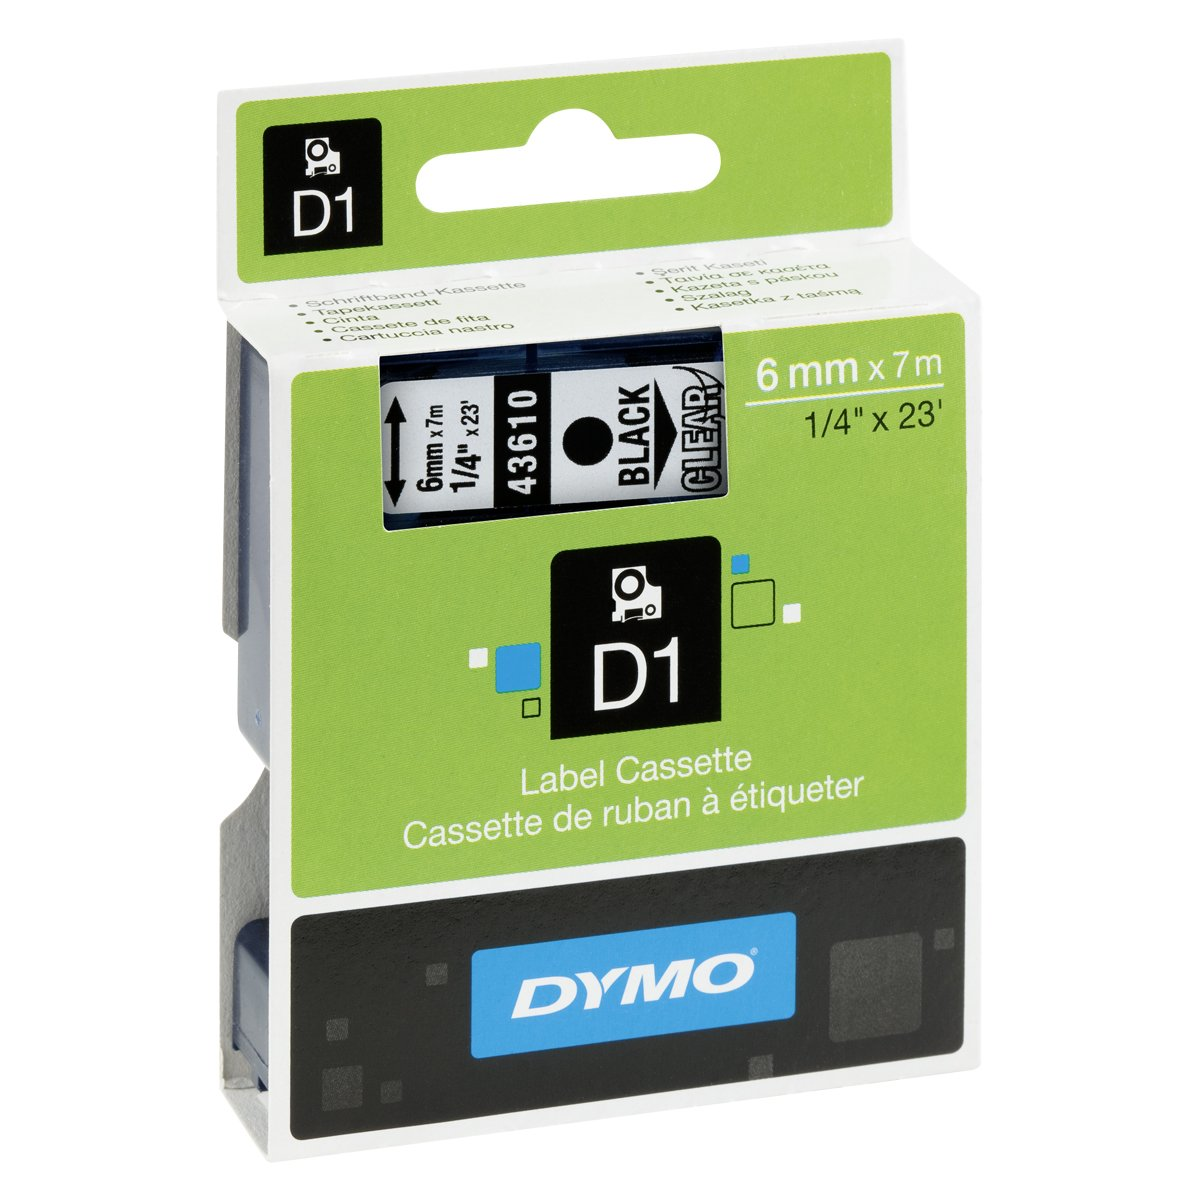 New Dym43610 Dymo D1 Standard Tape Cartridge For Label Makers Name Card Holder Binder 6222